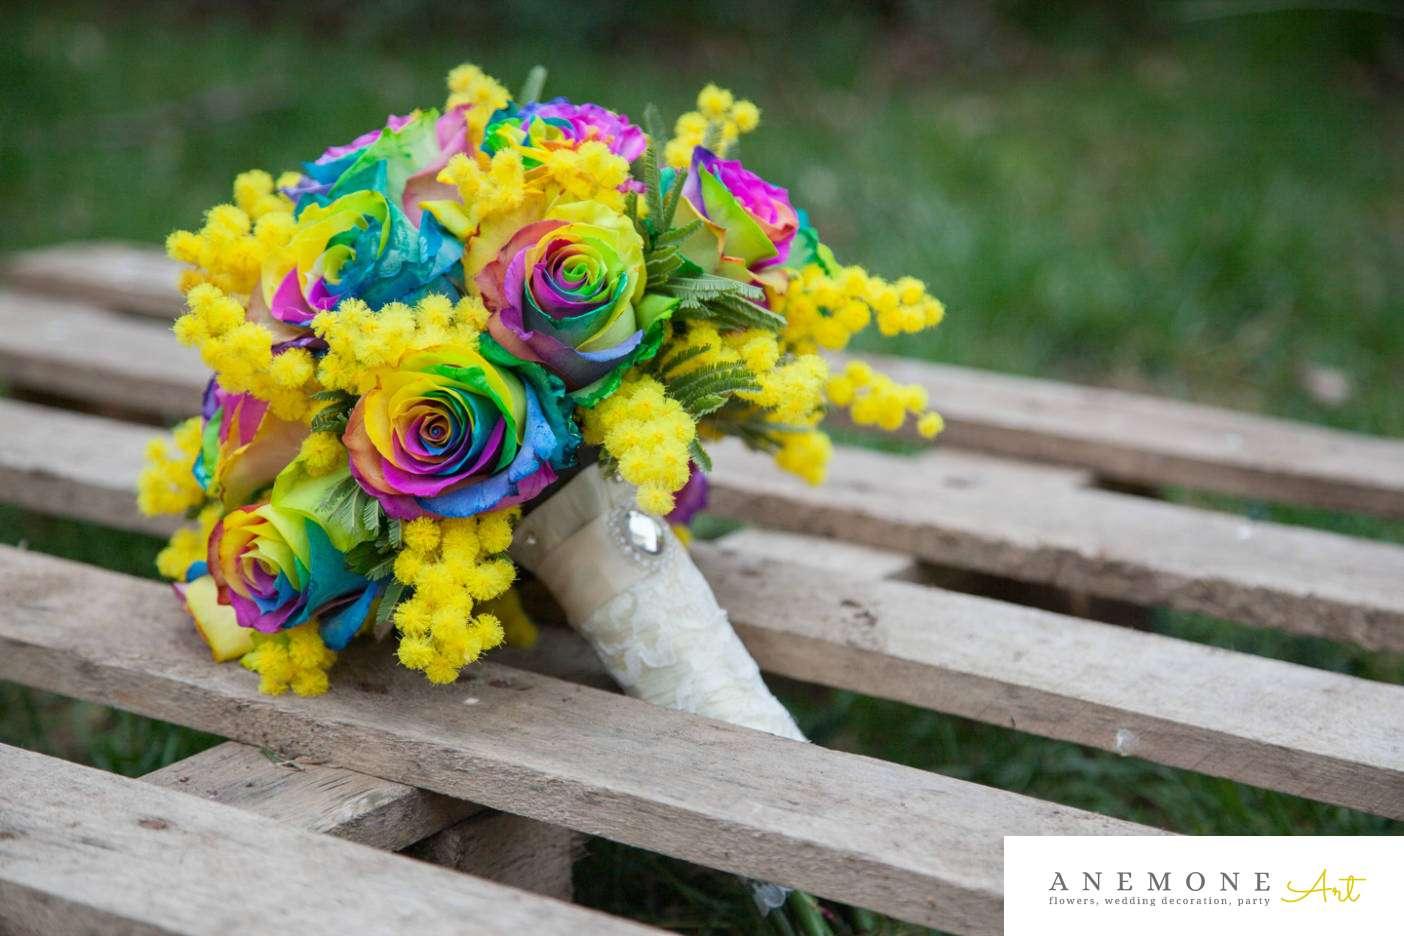 Poza, foto cu Flori de nunta buchet mireasa, maner buchet, multicolor, rotund, trandafiri in Arad, Timisoara, Oradea (wedding flowers, bouquets) nunta Arad, Timisoara, Oradea